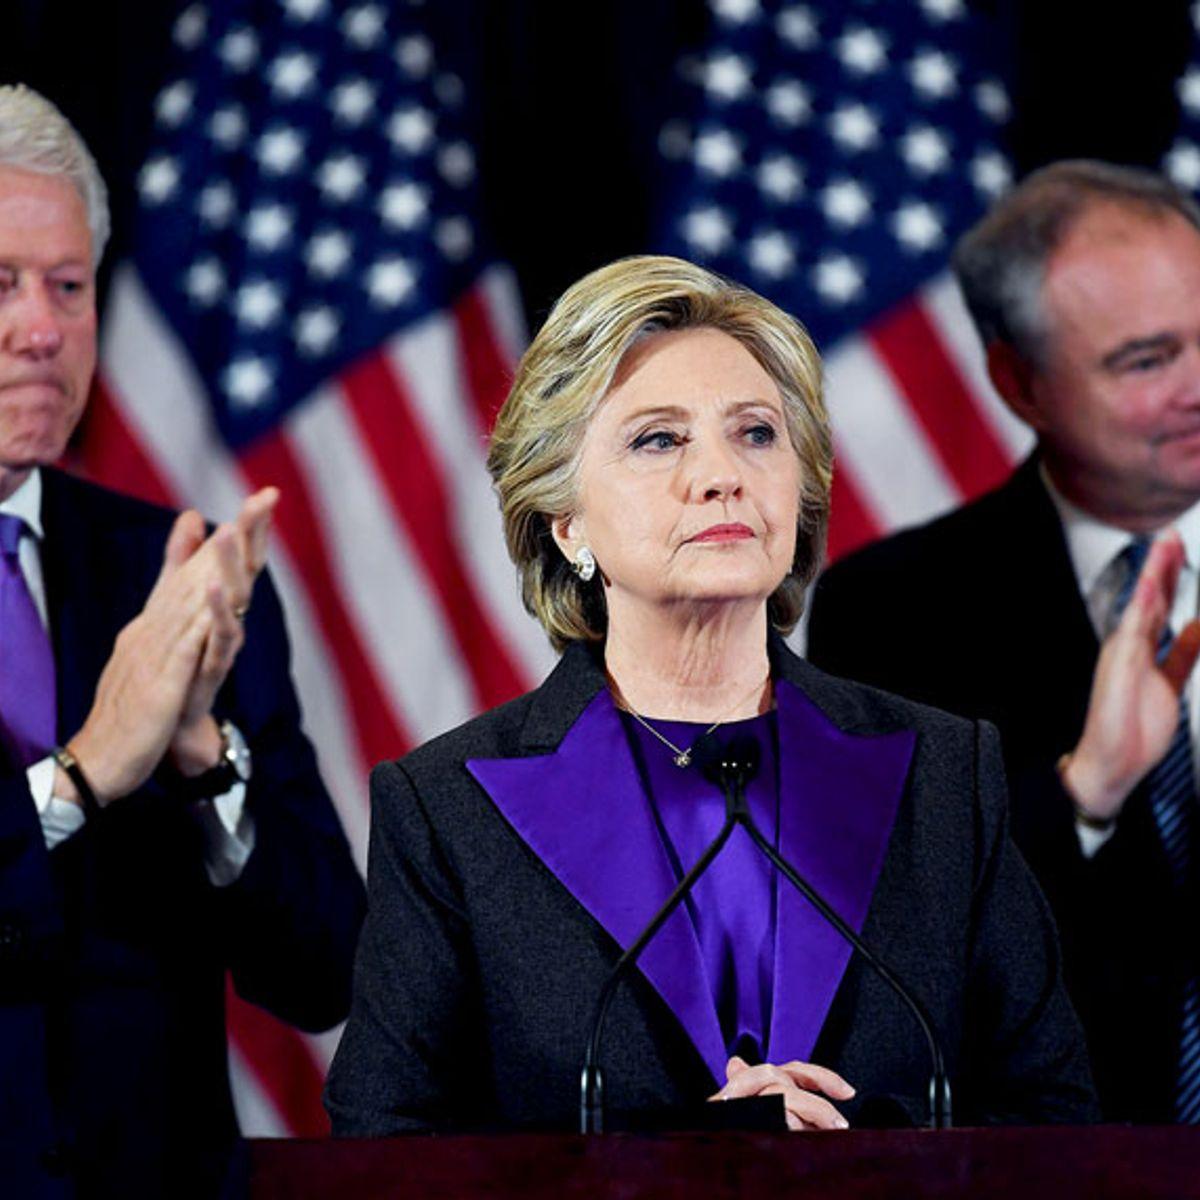 DOJ's IG report debunked Trump's FBI bias claims — but found anti-Hillary texts from FBI agent